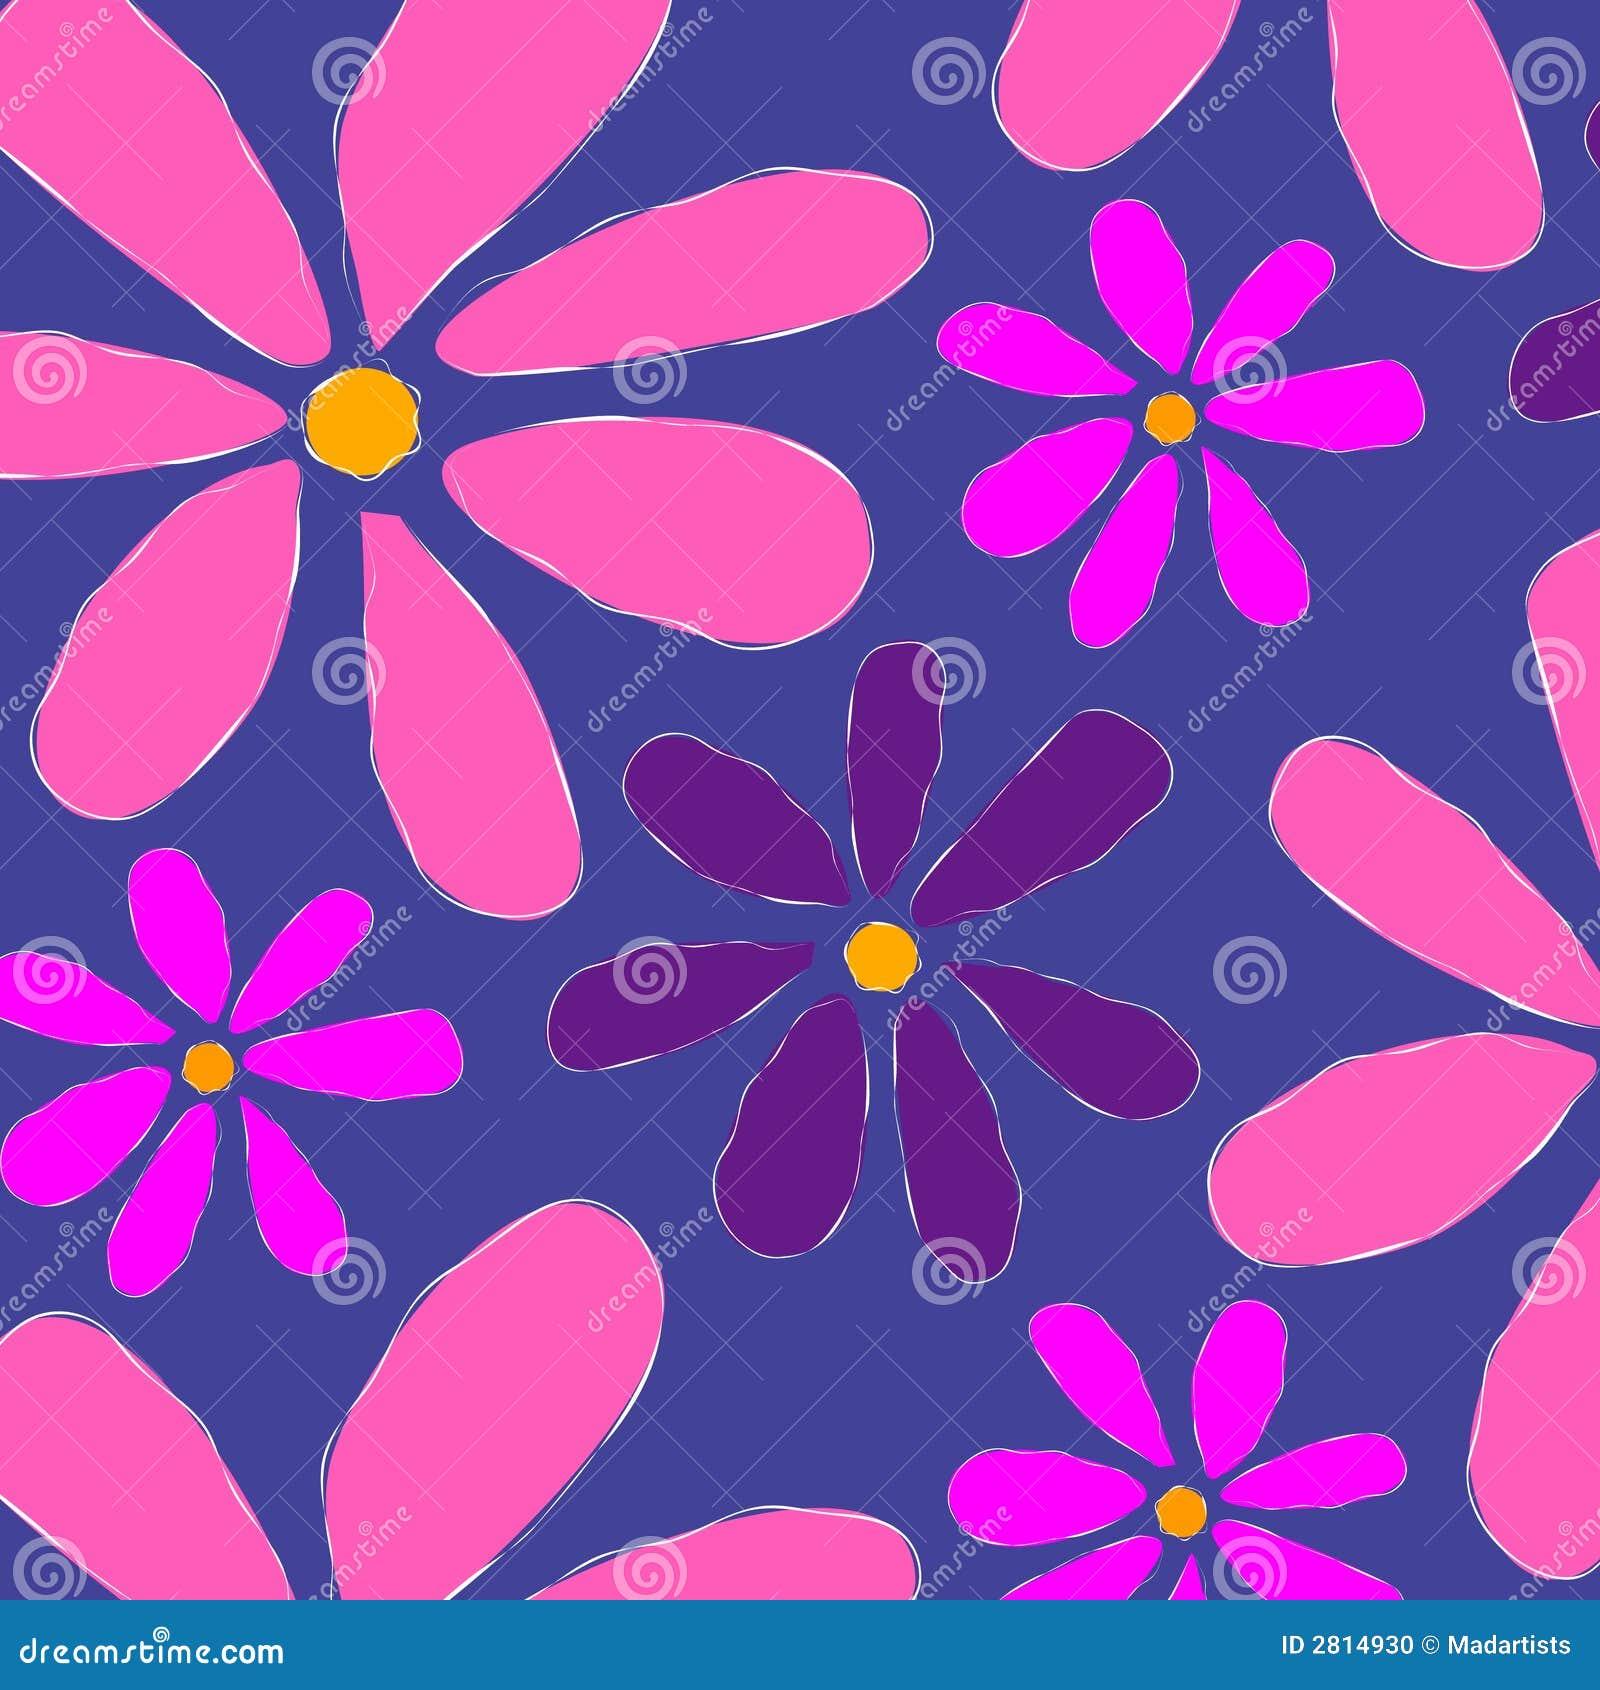 blumenmuster hintergrund rosa stockfoto bild 2814930. Black Bedroom Furniture Sets. Home Design Ideas